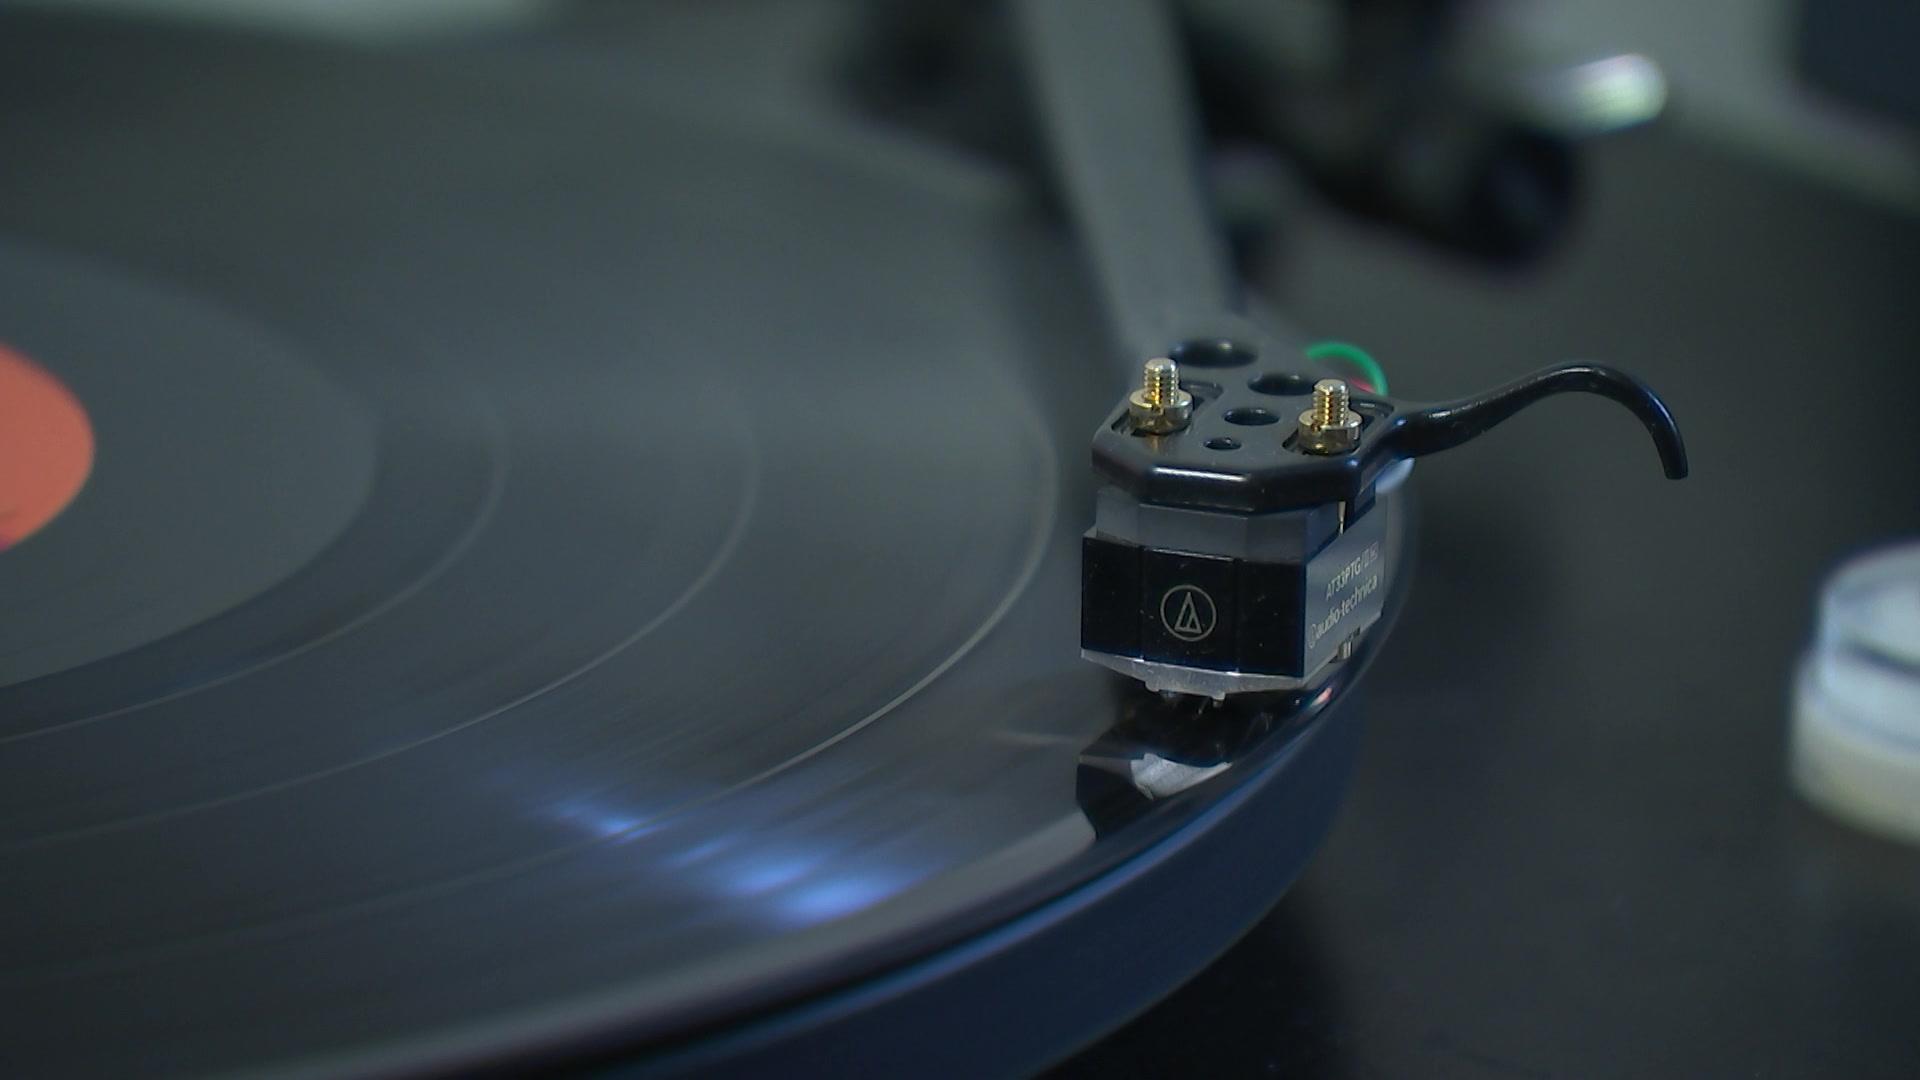 Vinylplader hitter